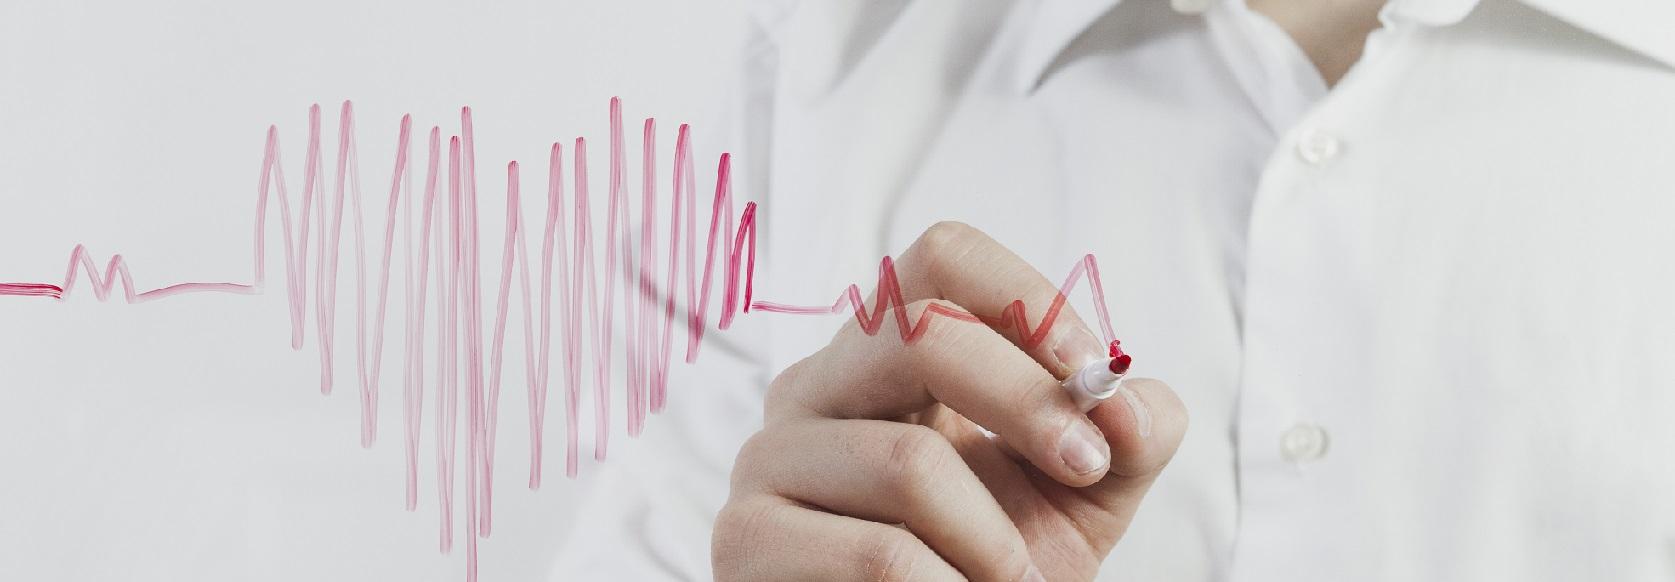 Cardiovascular Surgery (CVS)